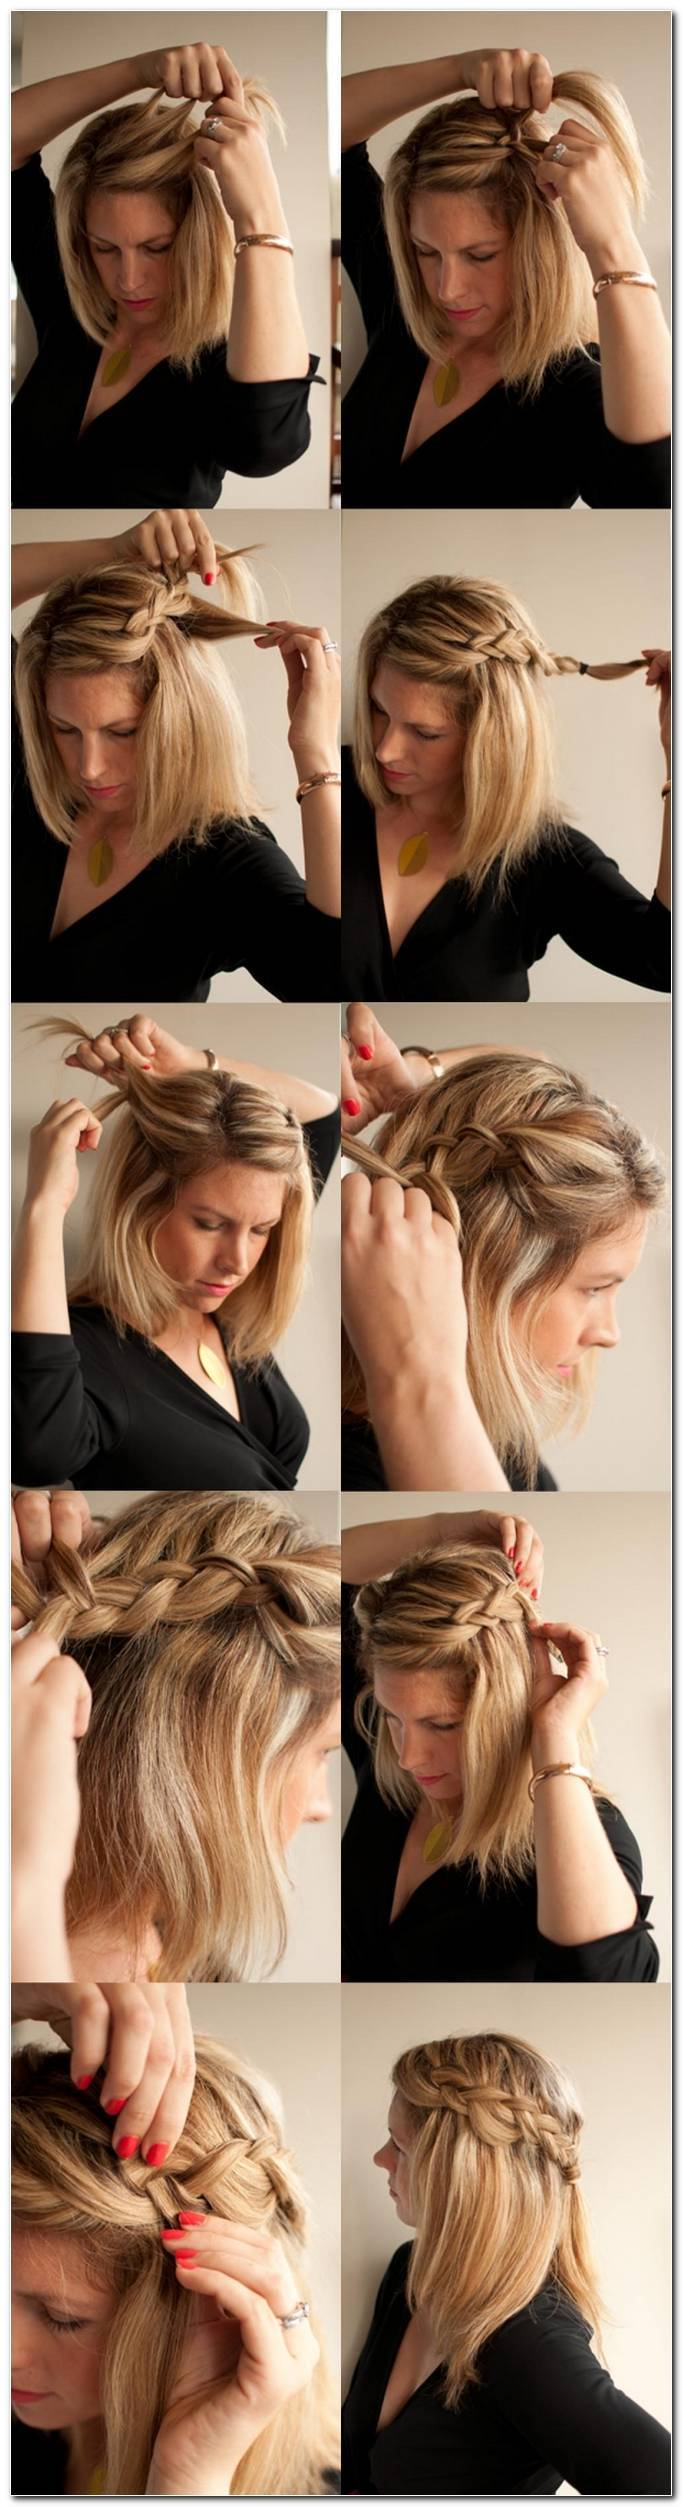 Frisuren Frauen Alltag